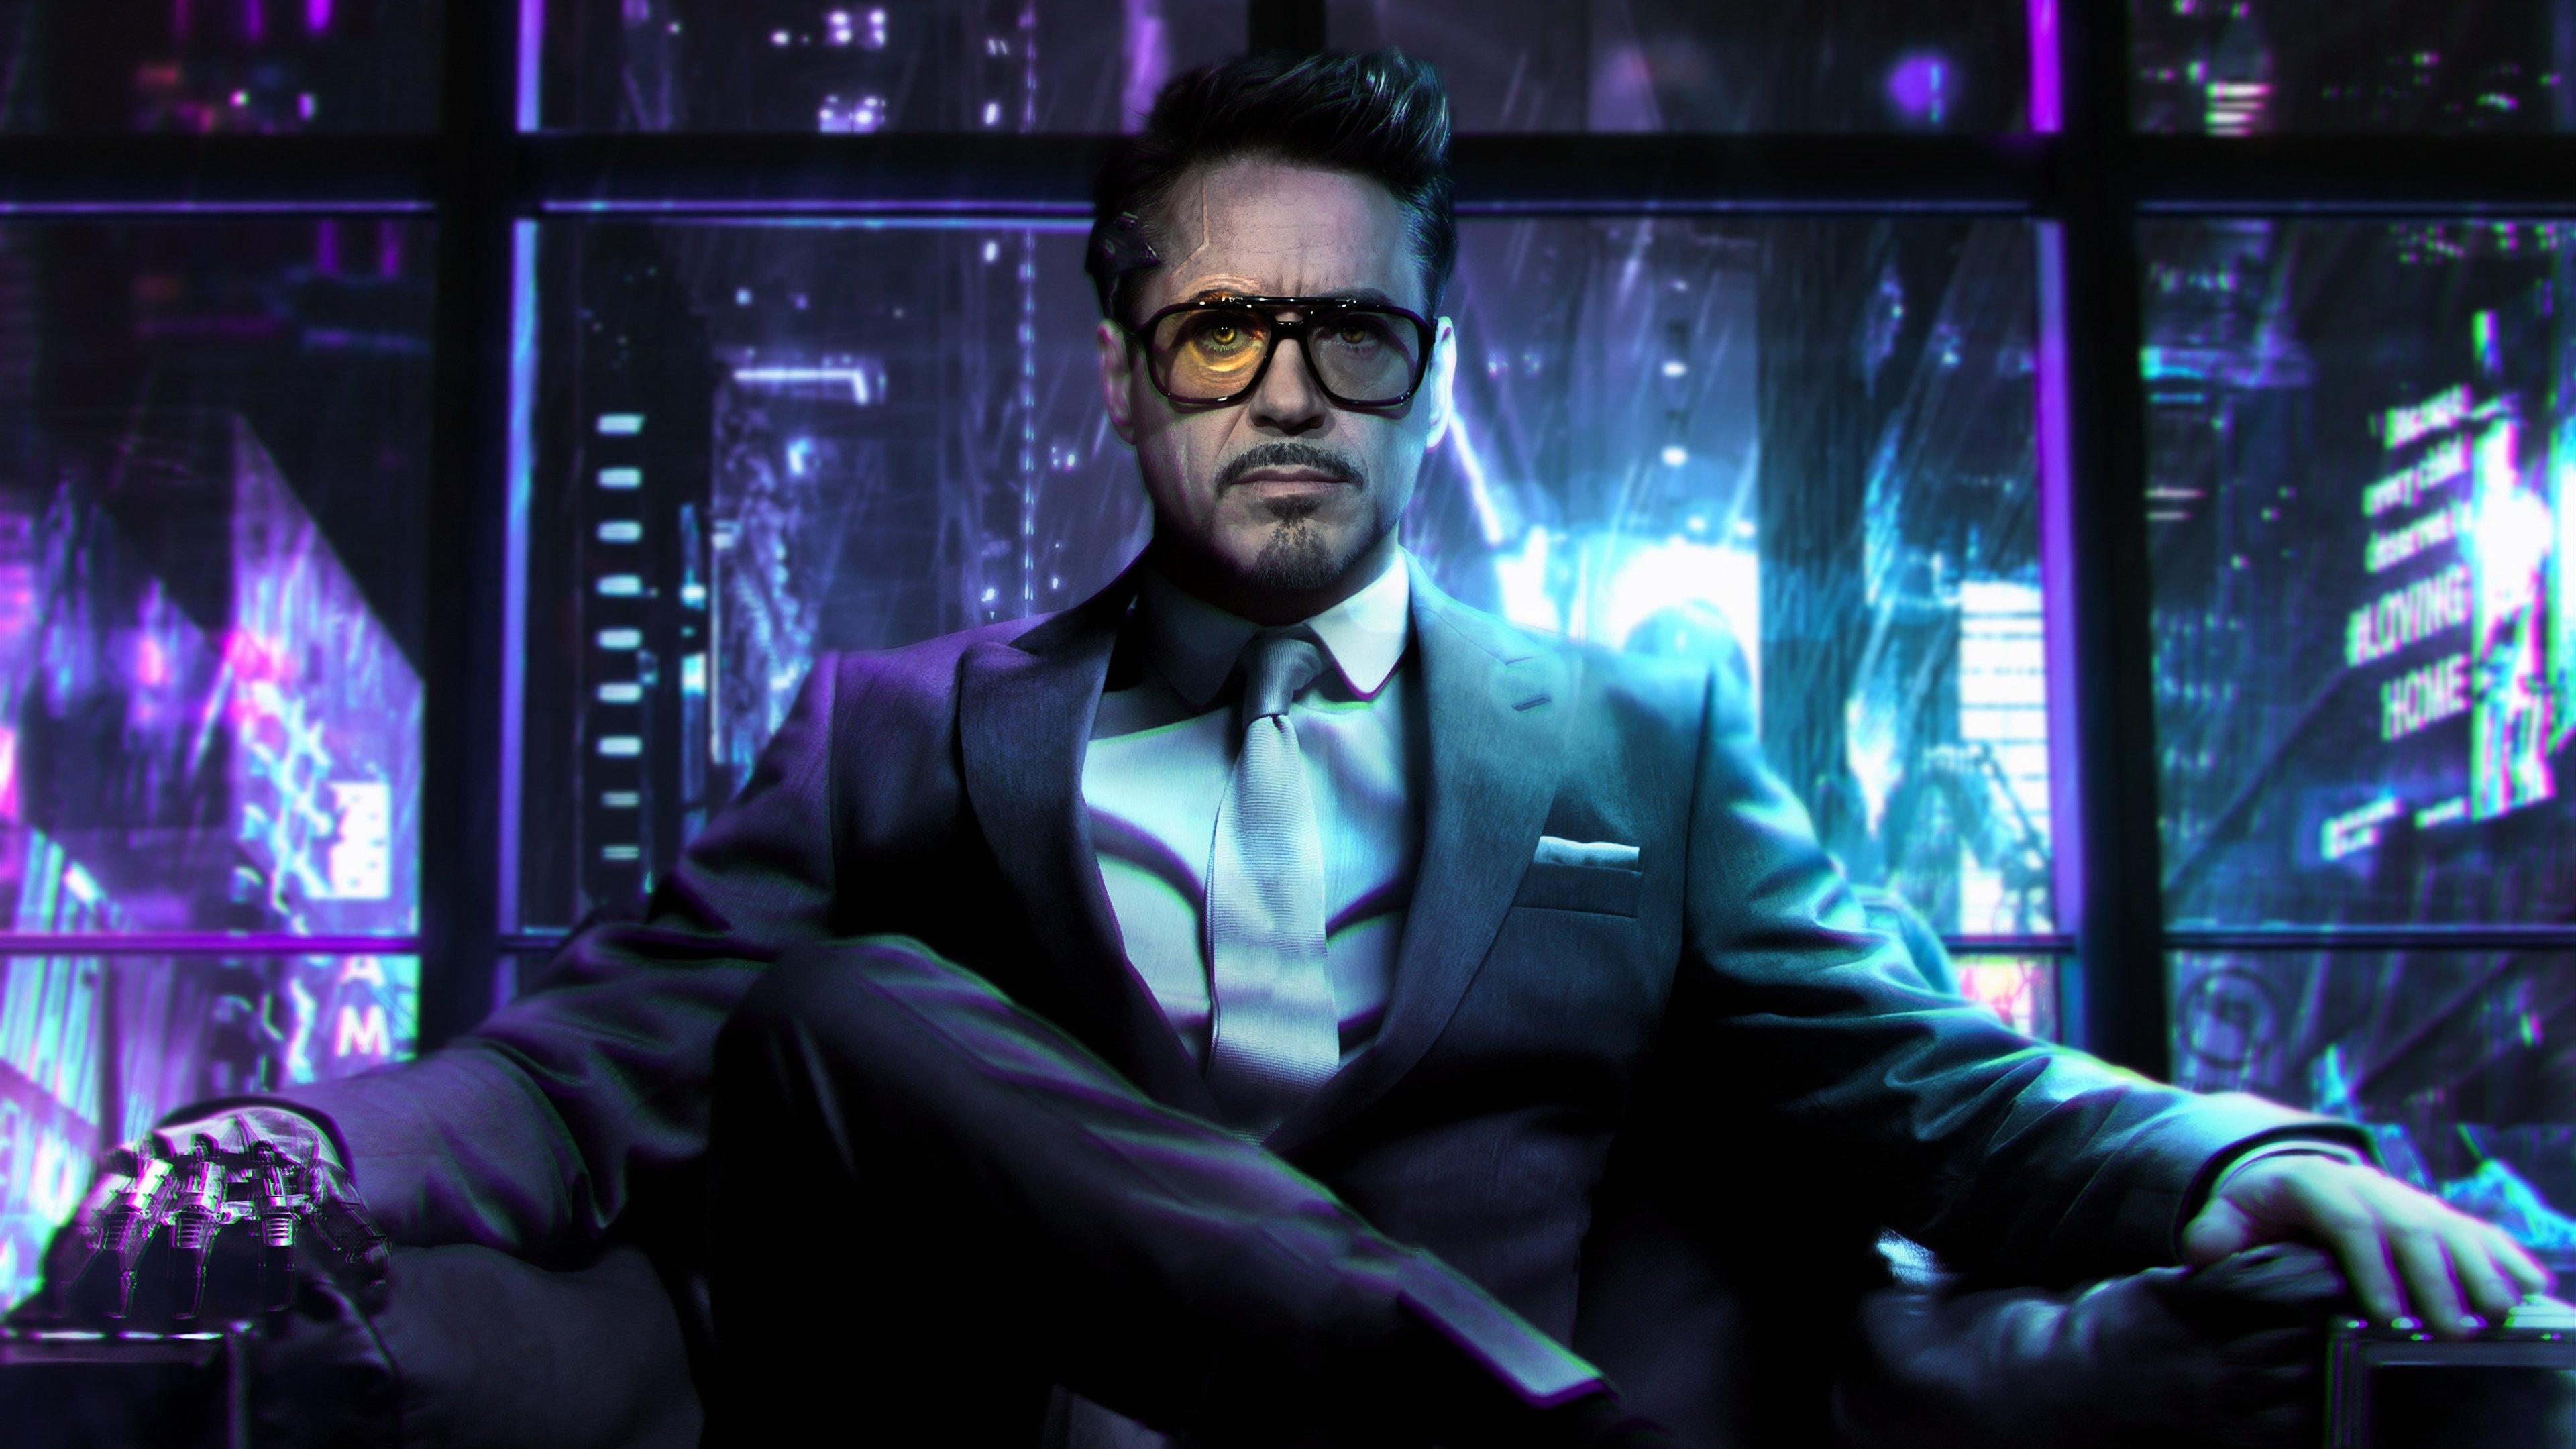 Cyberpunk Tony Stark Fanart Fondo De Pantalla 4k Ultra Hd Id